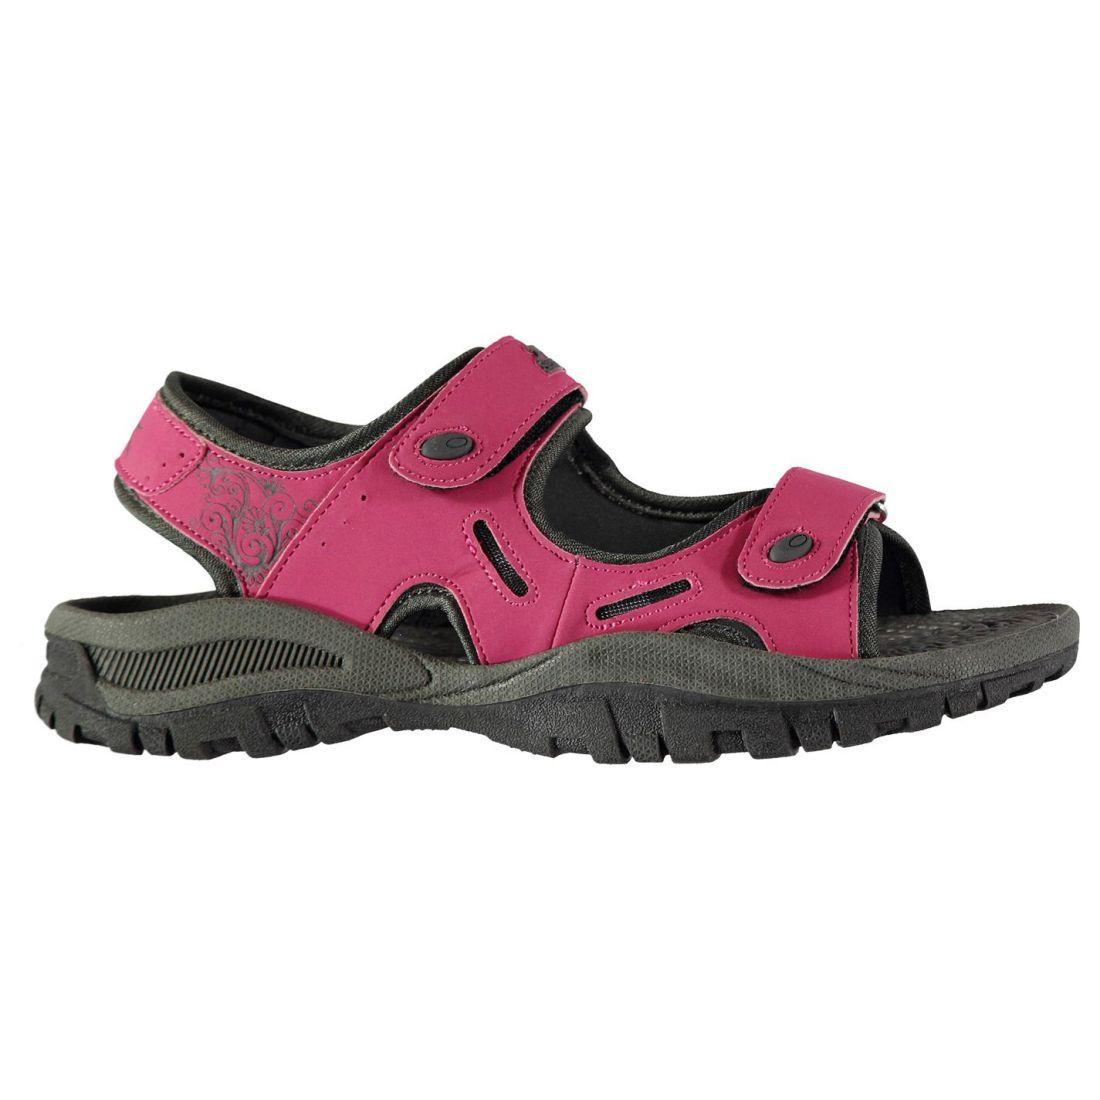 c0a5901bf9f8 Slazenger-Wave-Sandal-Ladies-Athletic-Sandals thumbnail 10